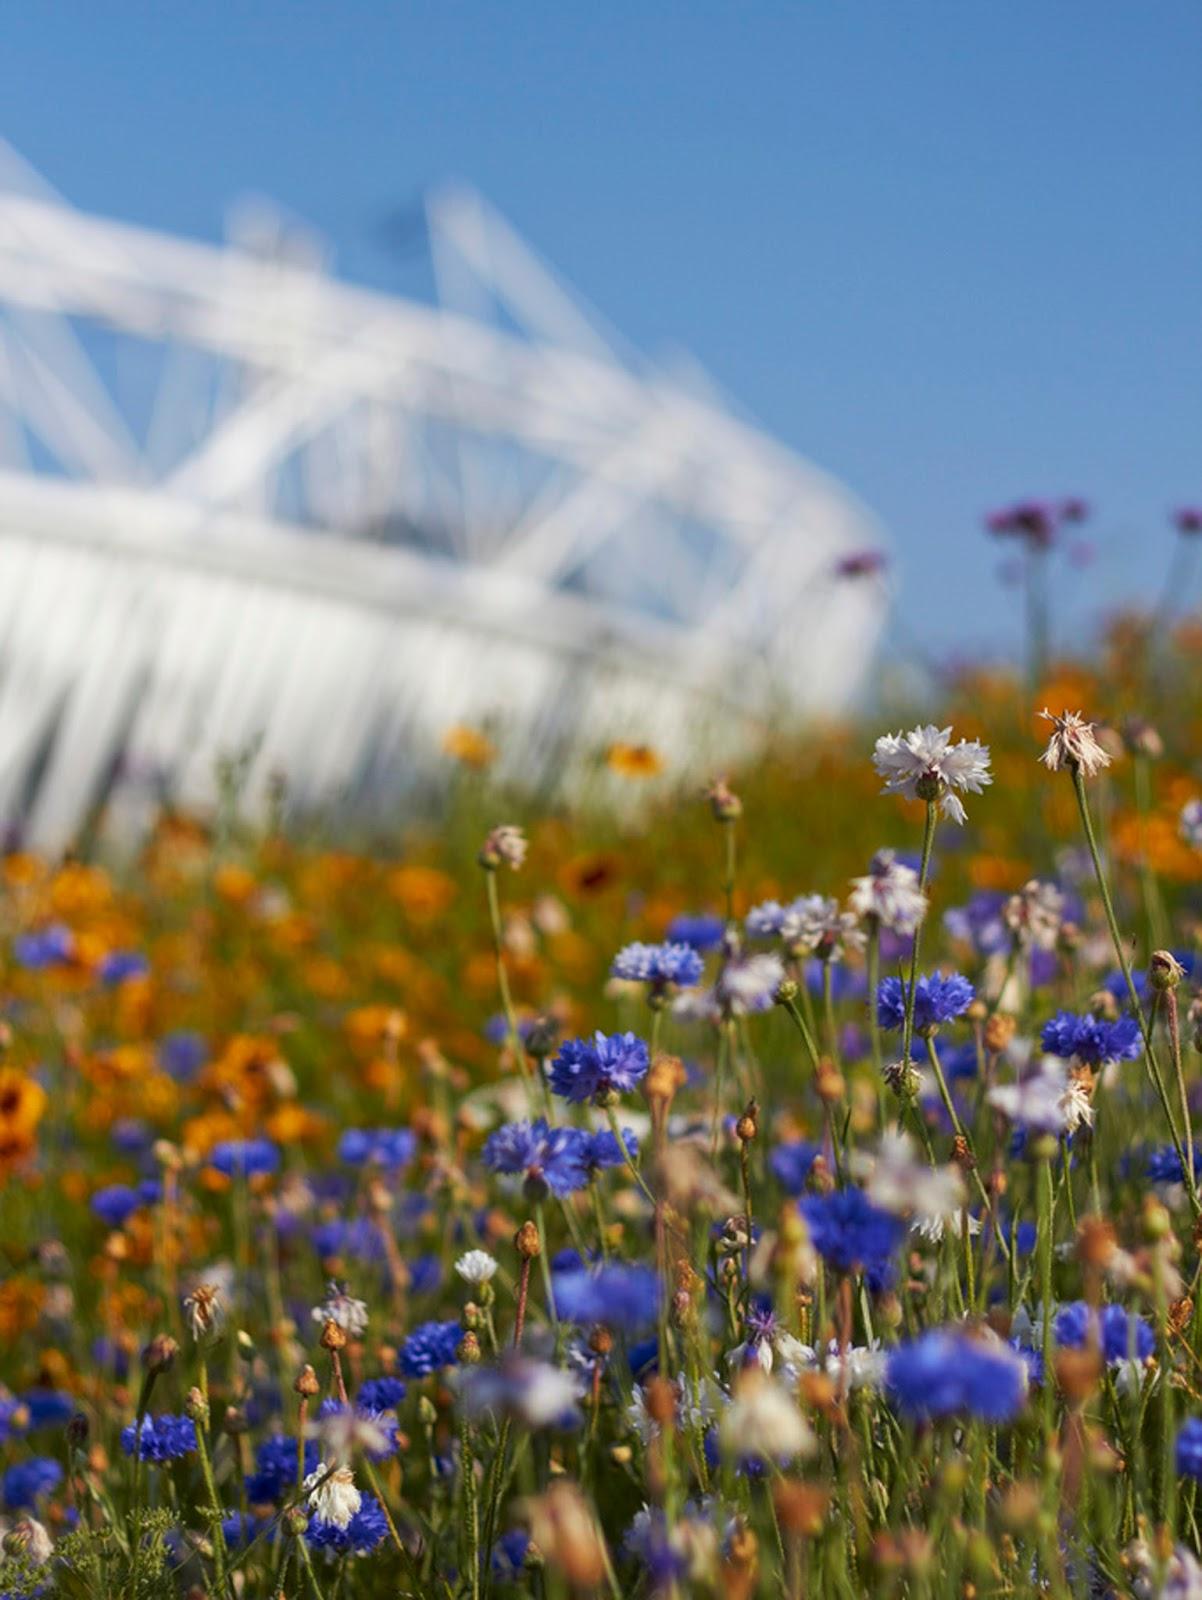 London 2012 Olympic Games Park flowers Stadium